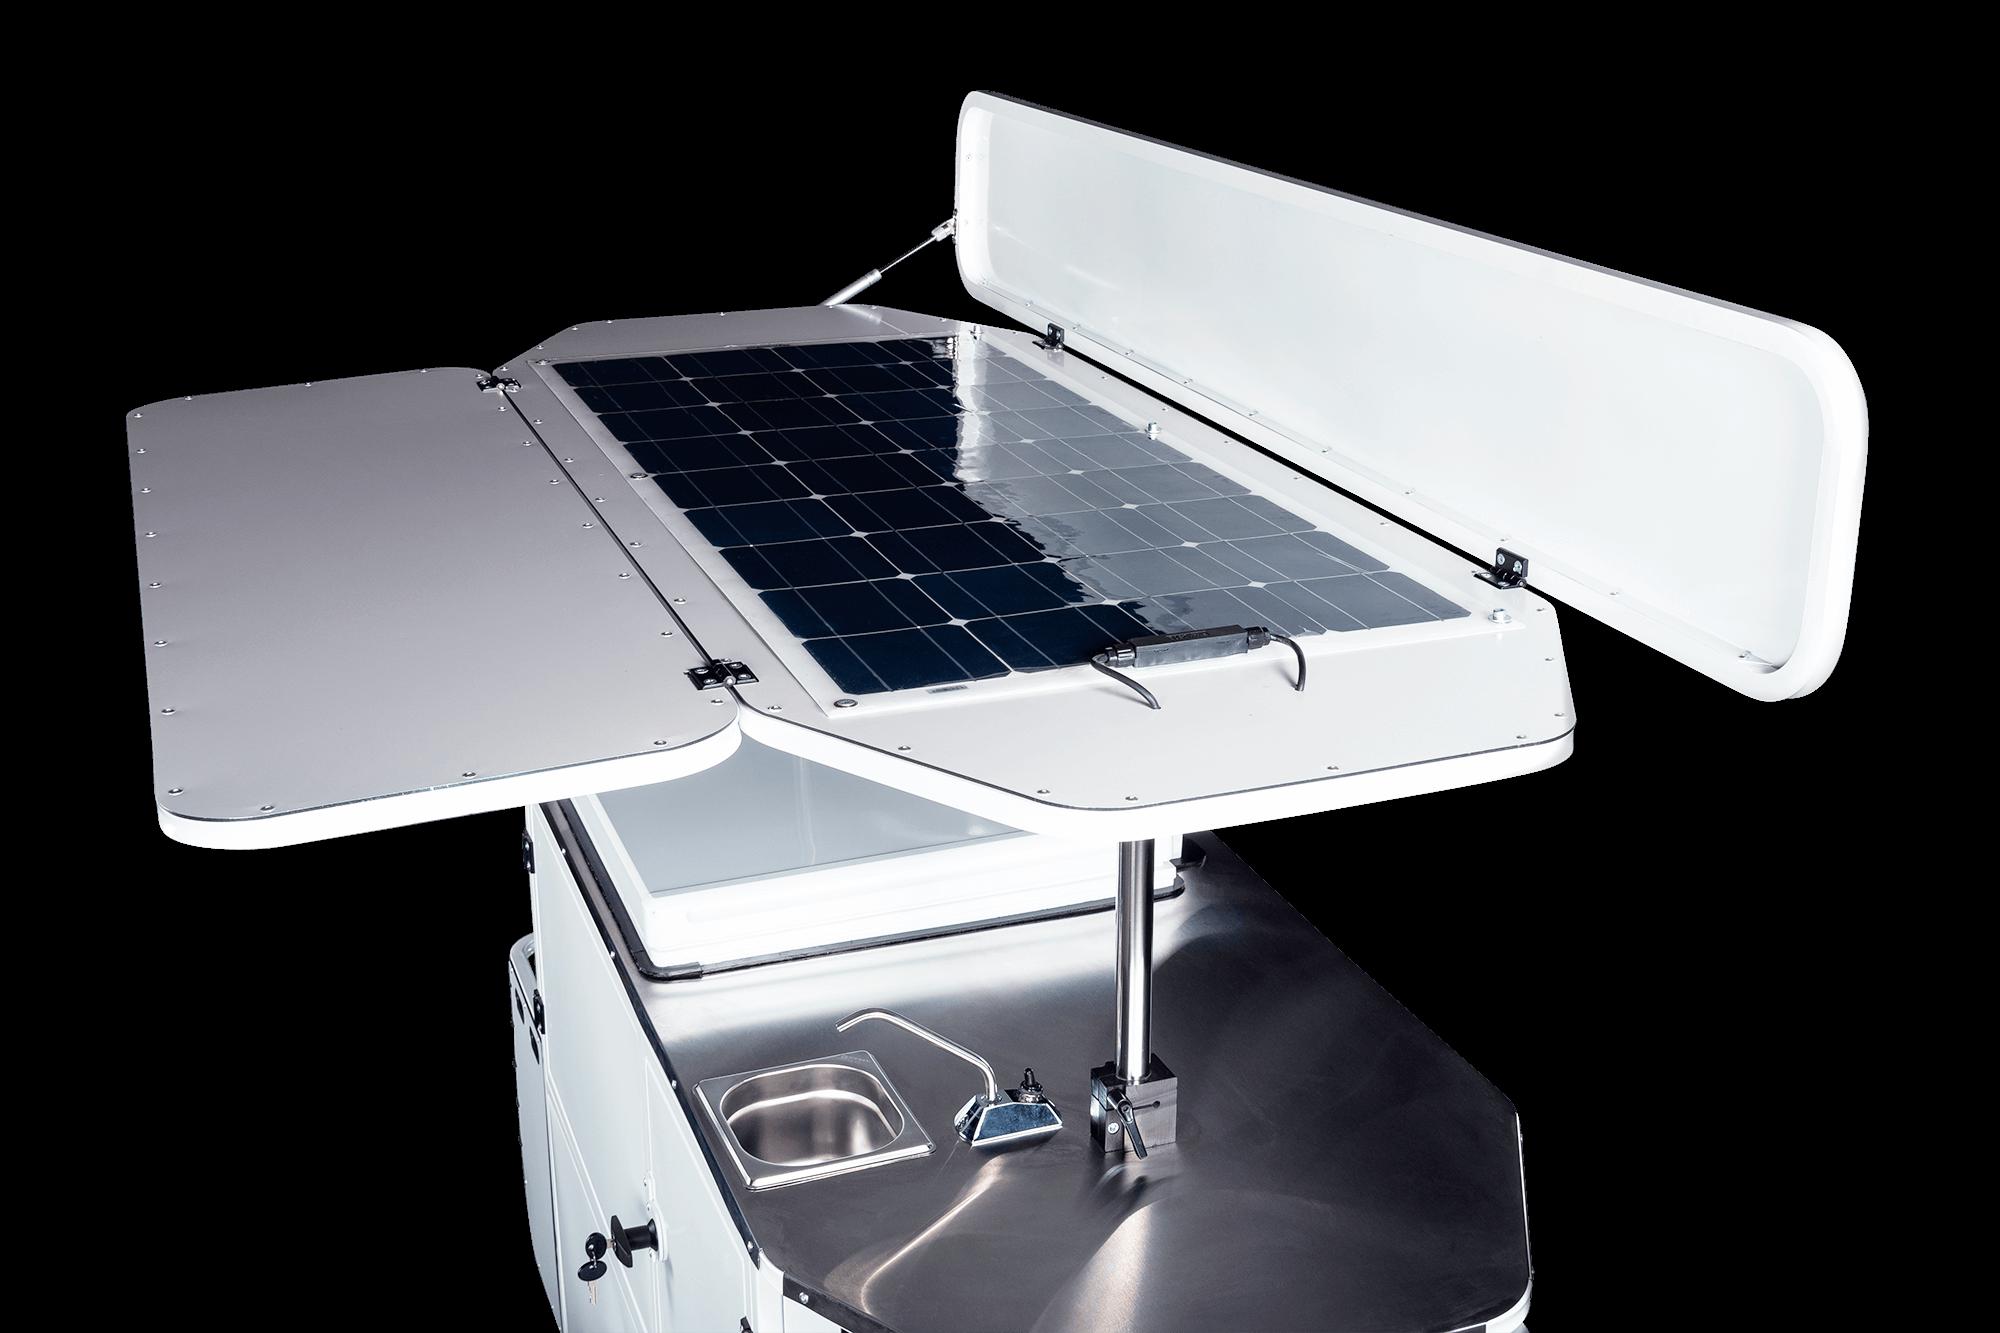 Bizz On Wheels solar panel kit for ice cream cart